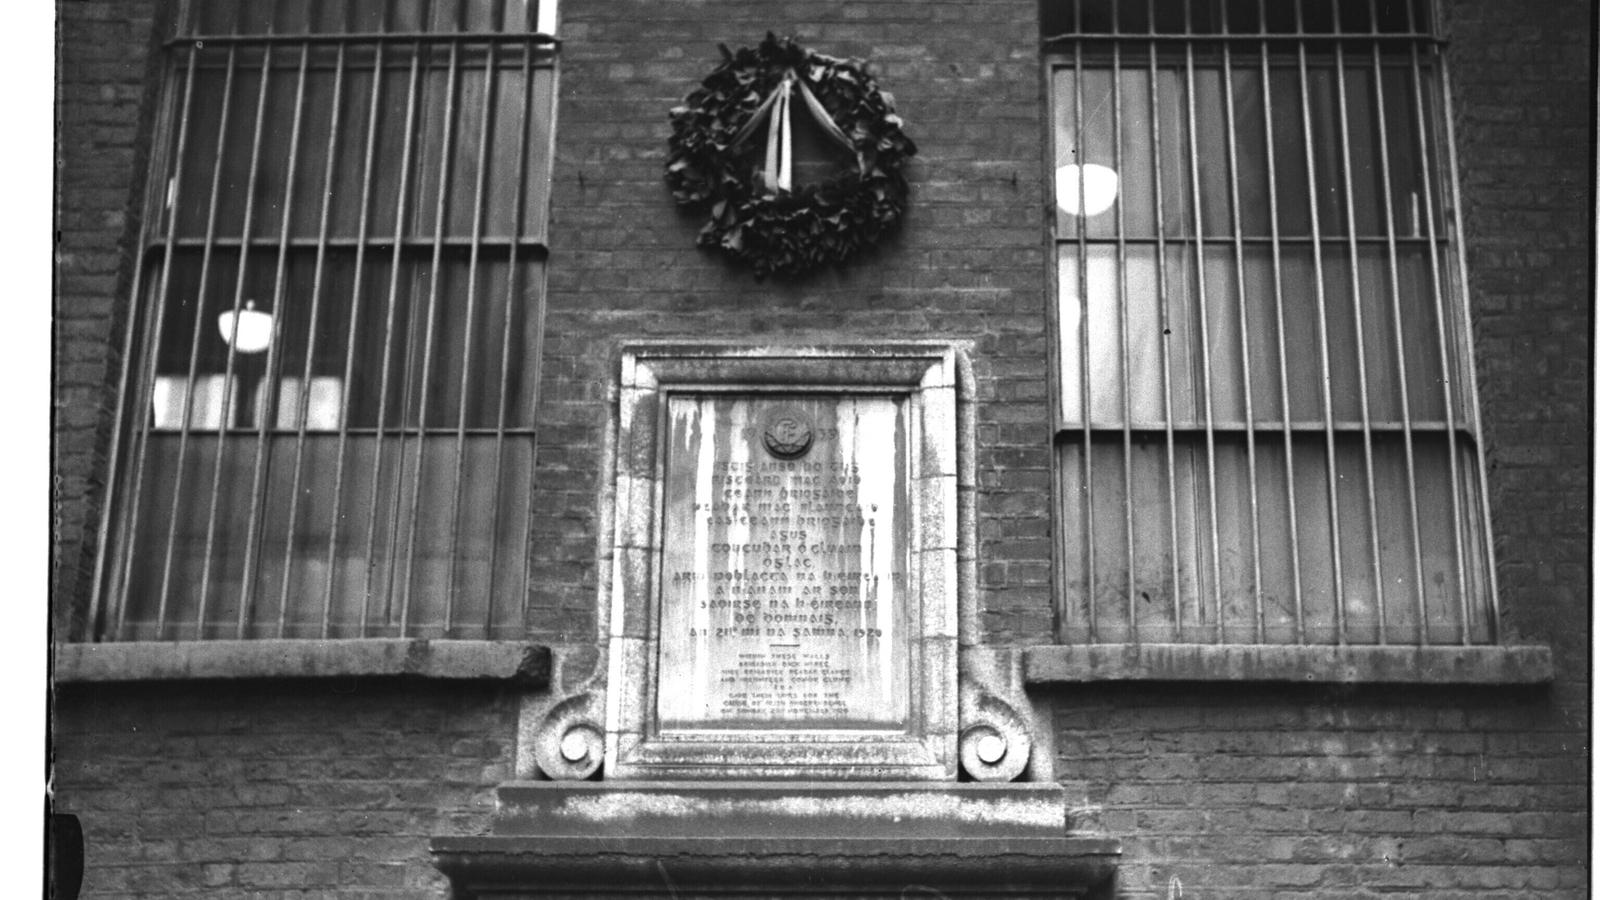 Image - Dublin Castle plaque to Richard McKee, Peadar Clancy and Conor Clune (Credit: RTE Stills Library)